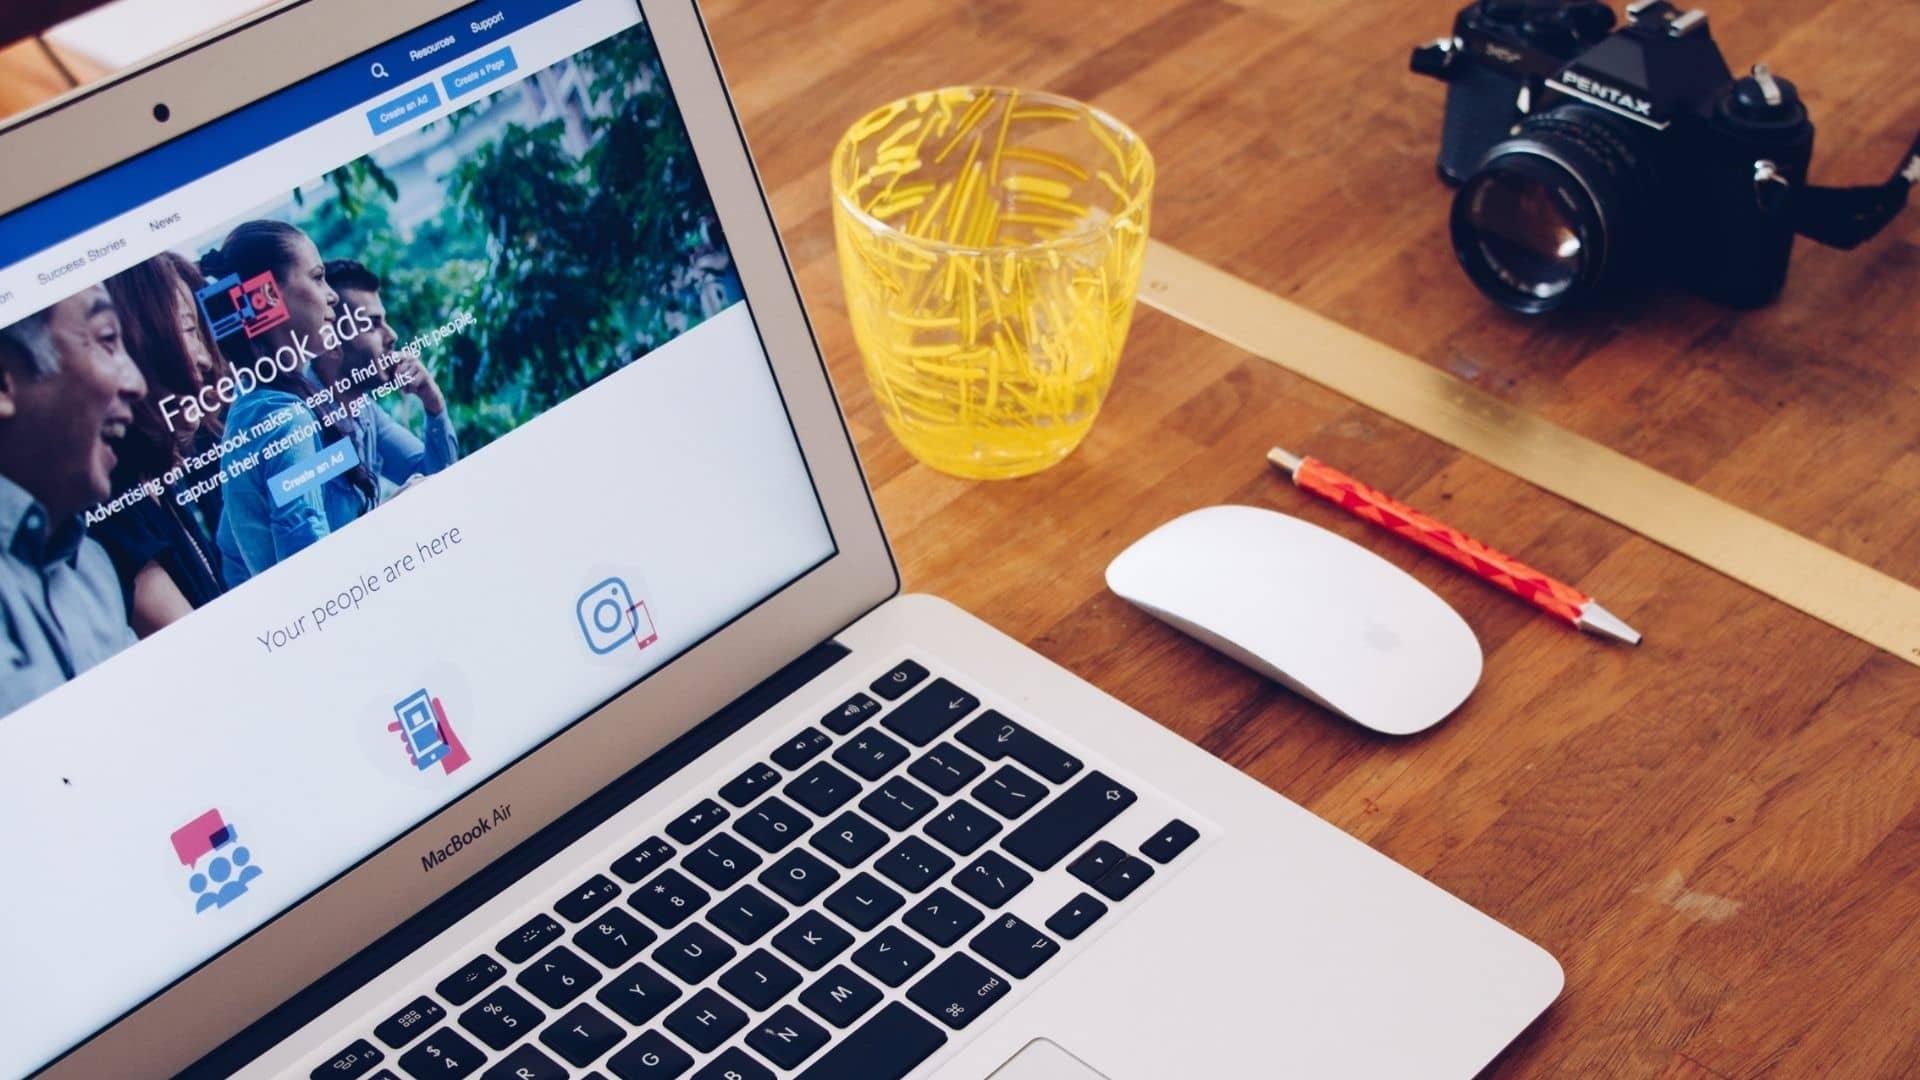 Marketing Ideas, Marketing Strategies, SEO ideas, Marketing Ideas for small business, Marketing Strategies for small business, SEO ideas for small business